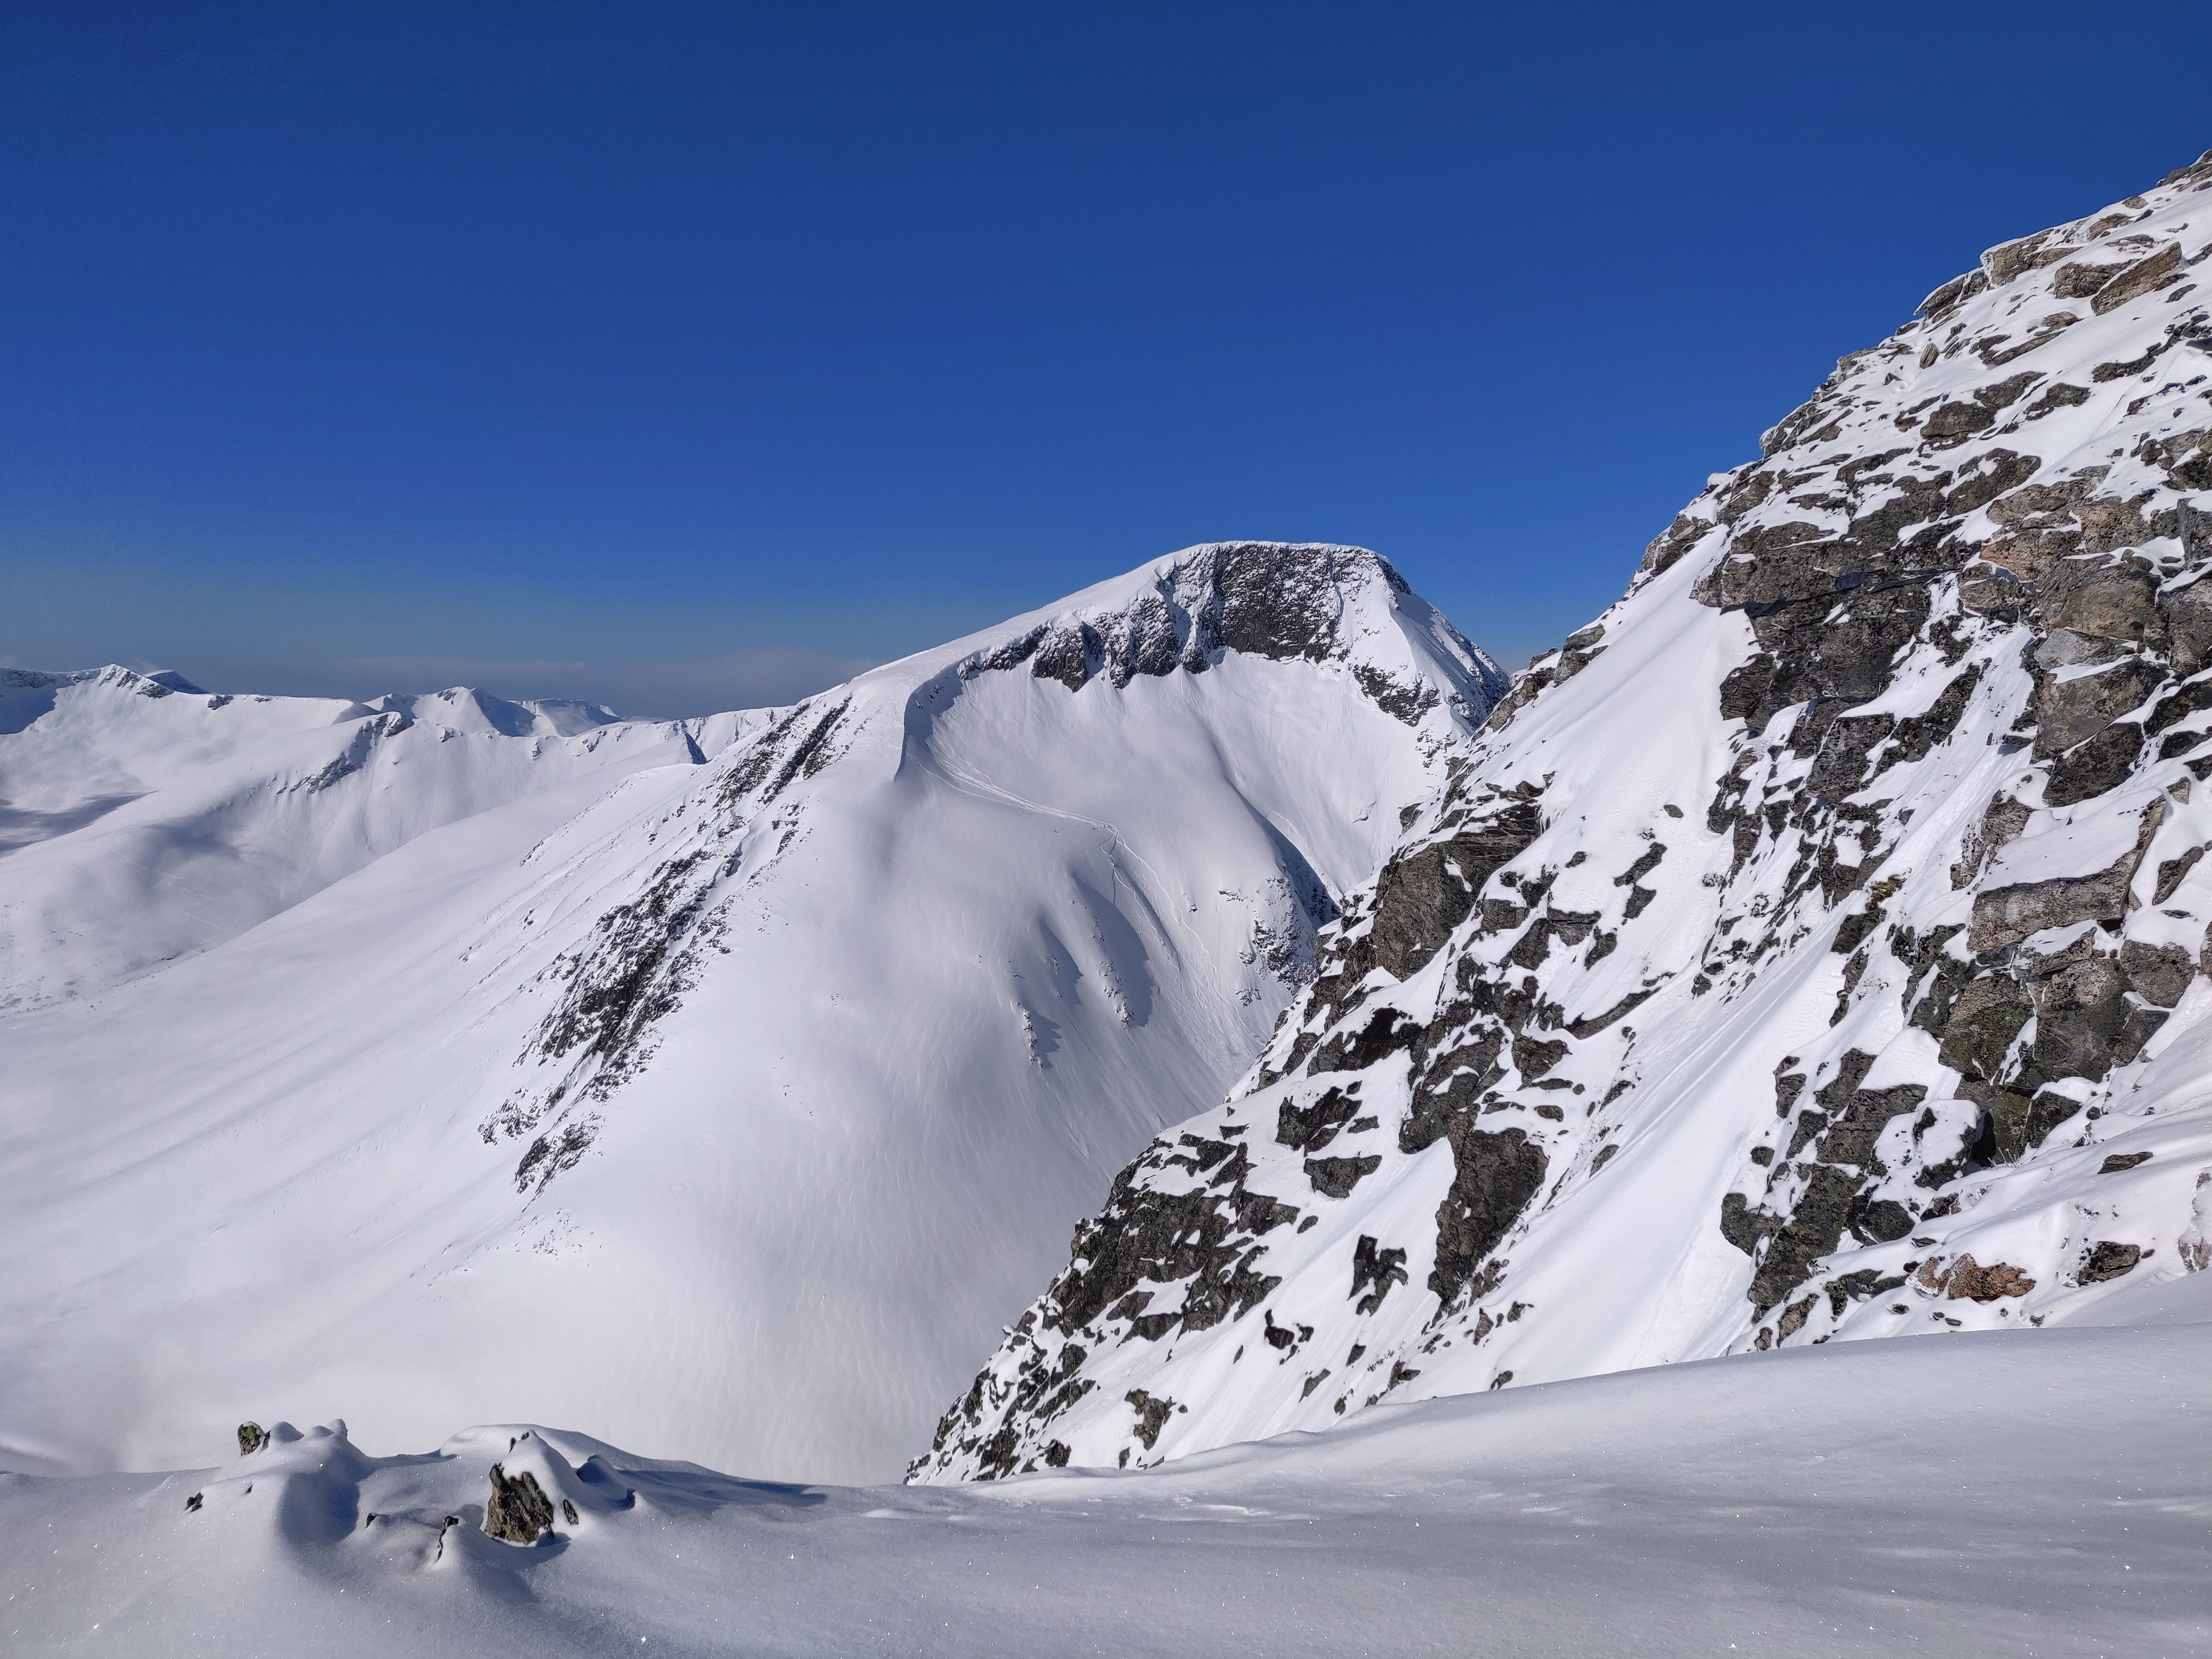 20190309 Romsdal Kirketaket O Kyrkjetaket (1.440 M) Desde